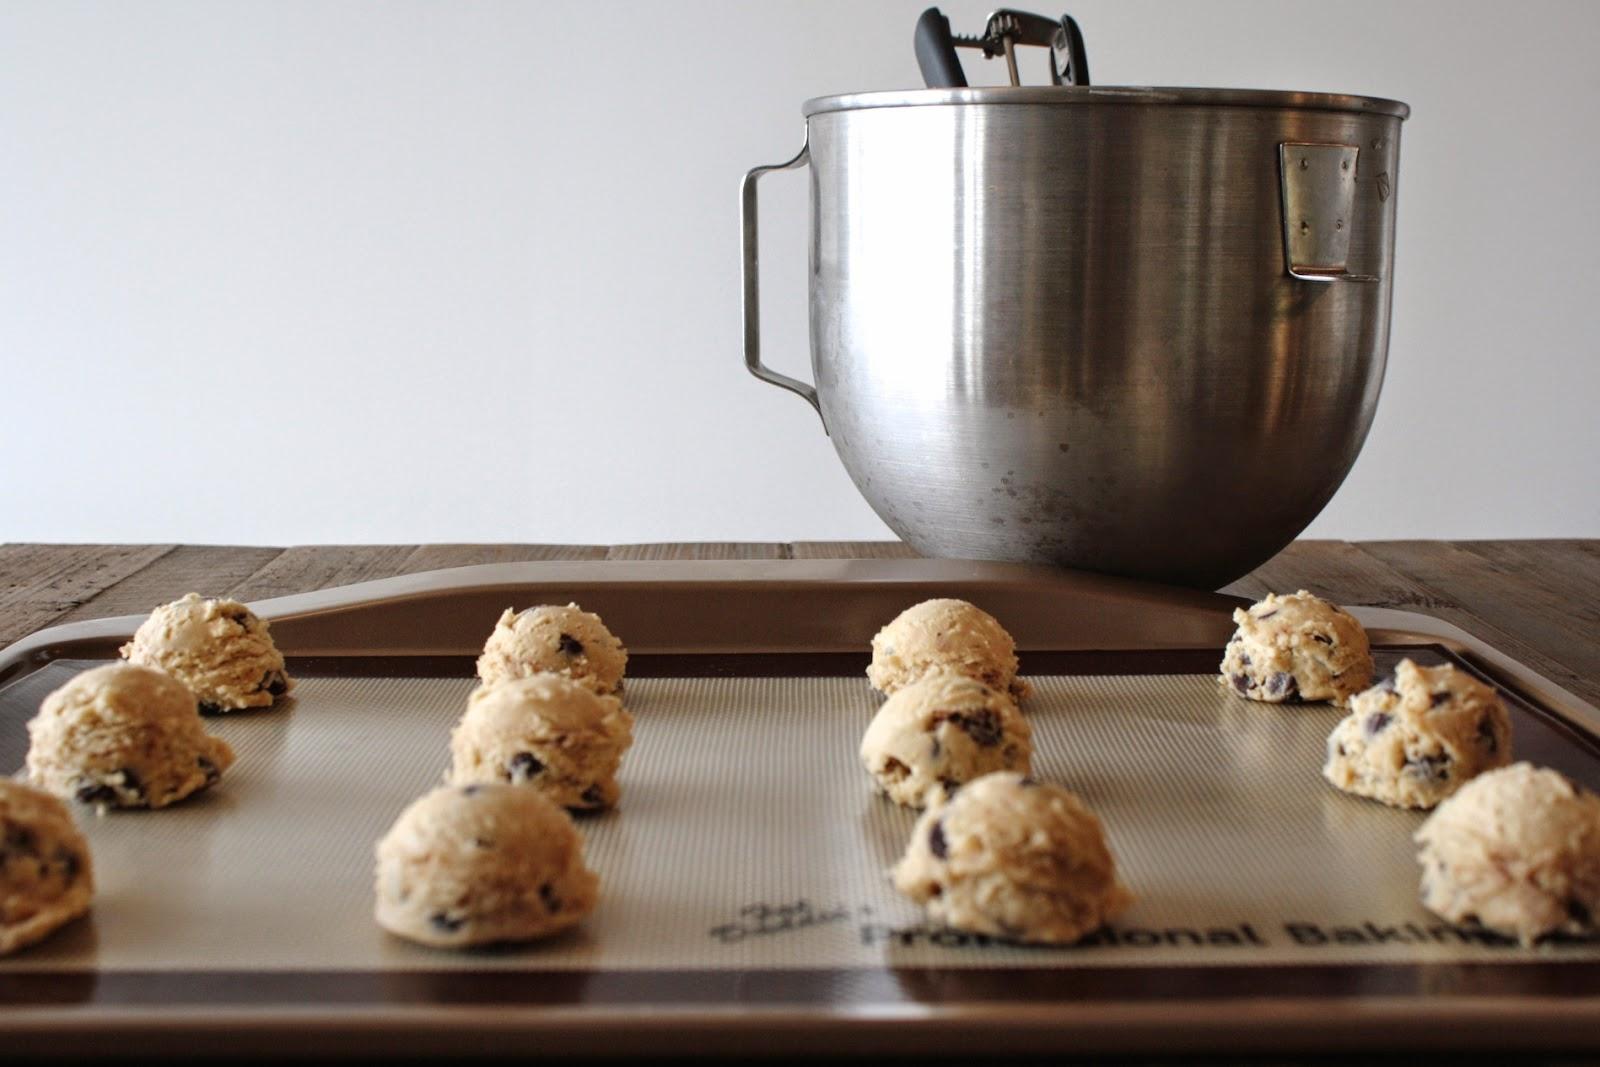 Cookie dough on a baking sheet.